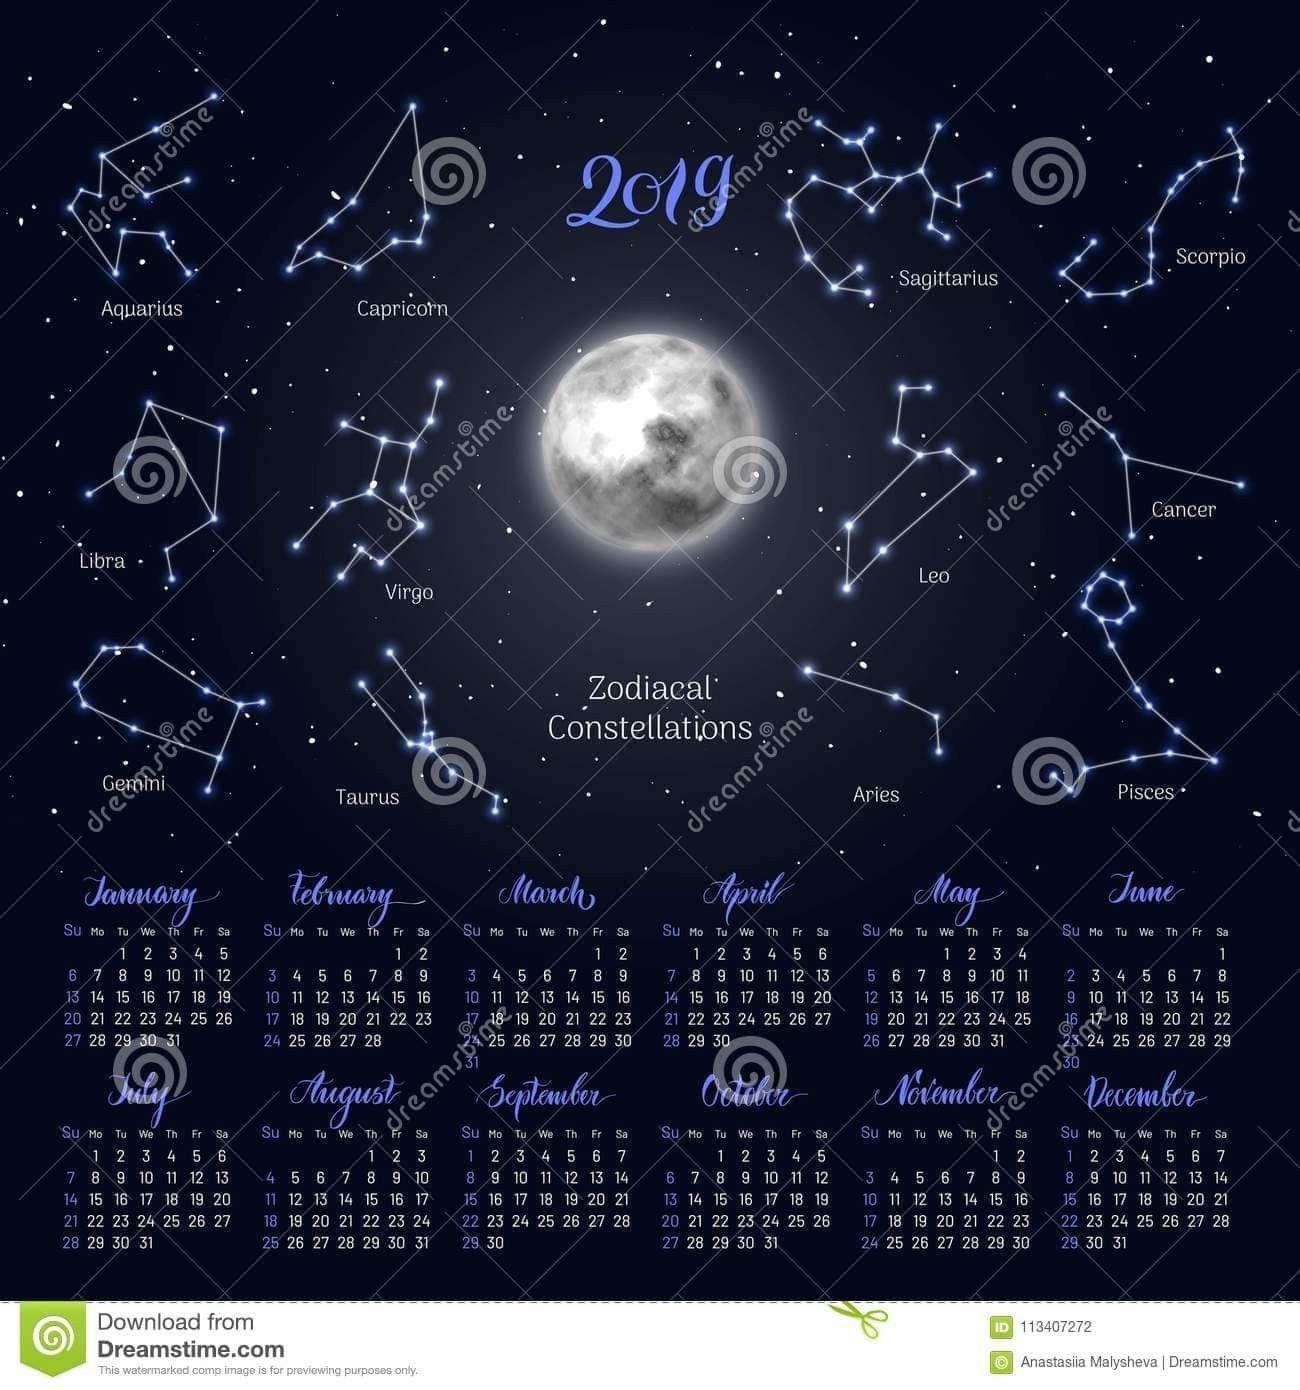 Pin By Tracie Churches On Horoscopes